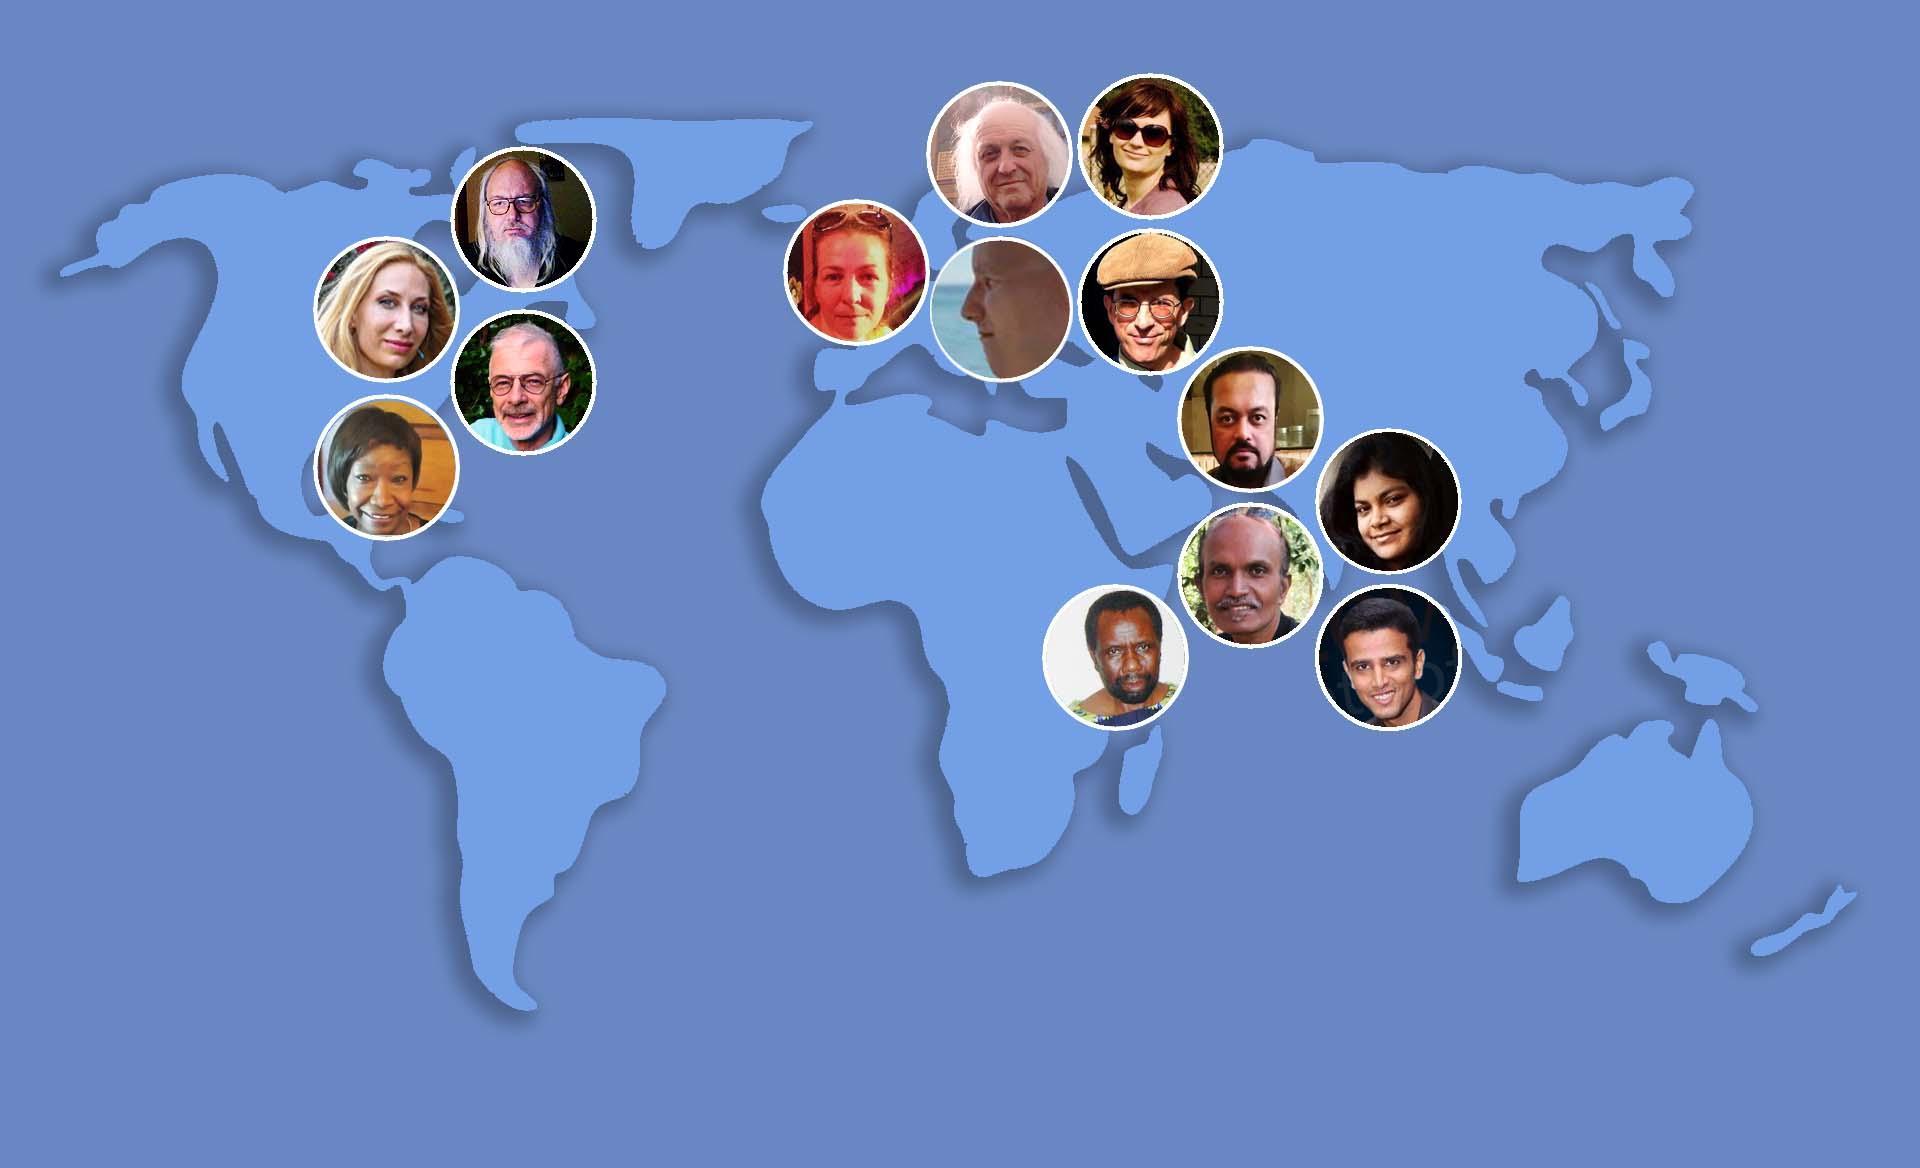 johntext authors world map 2017